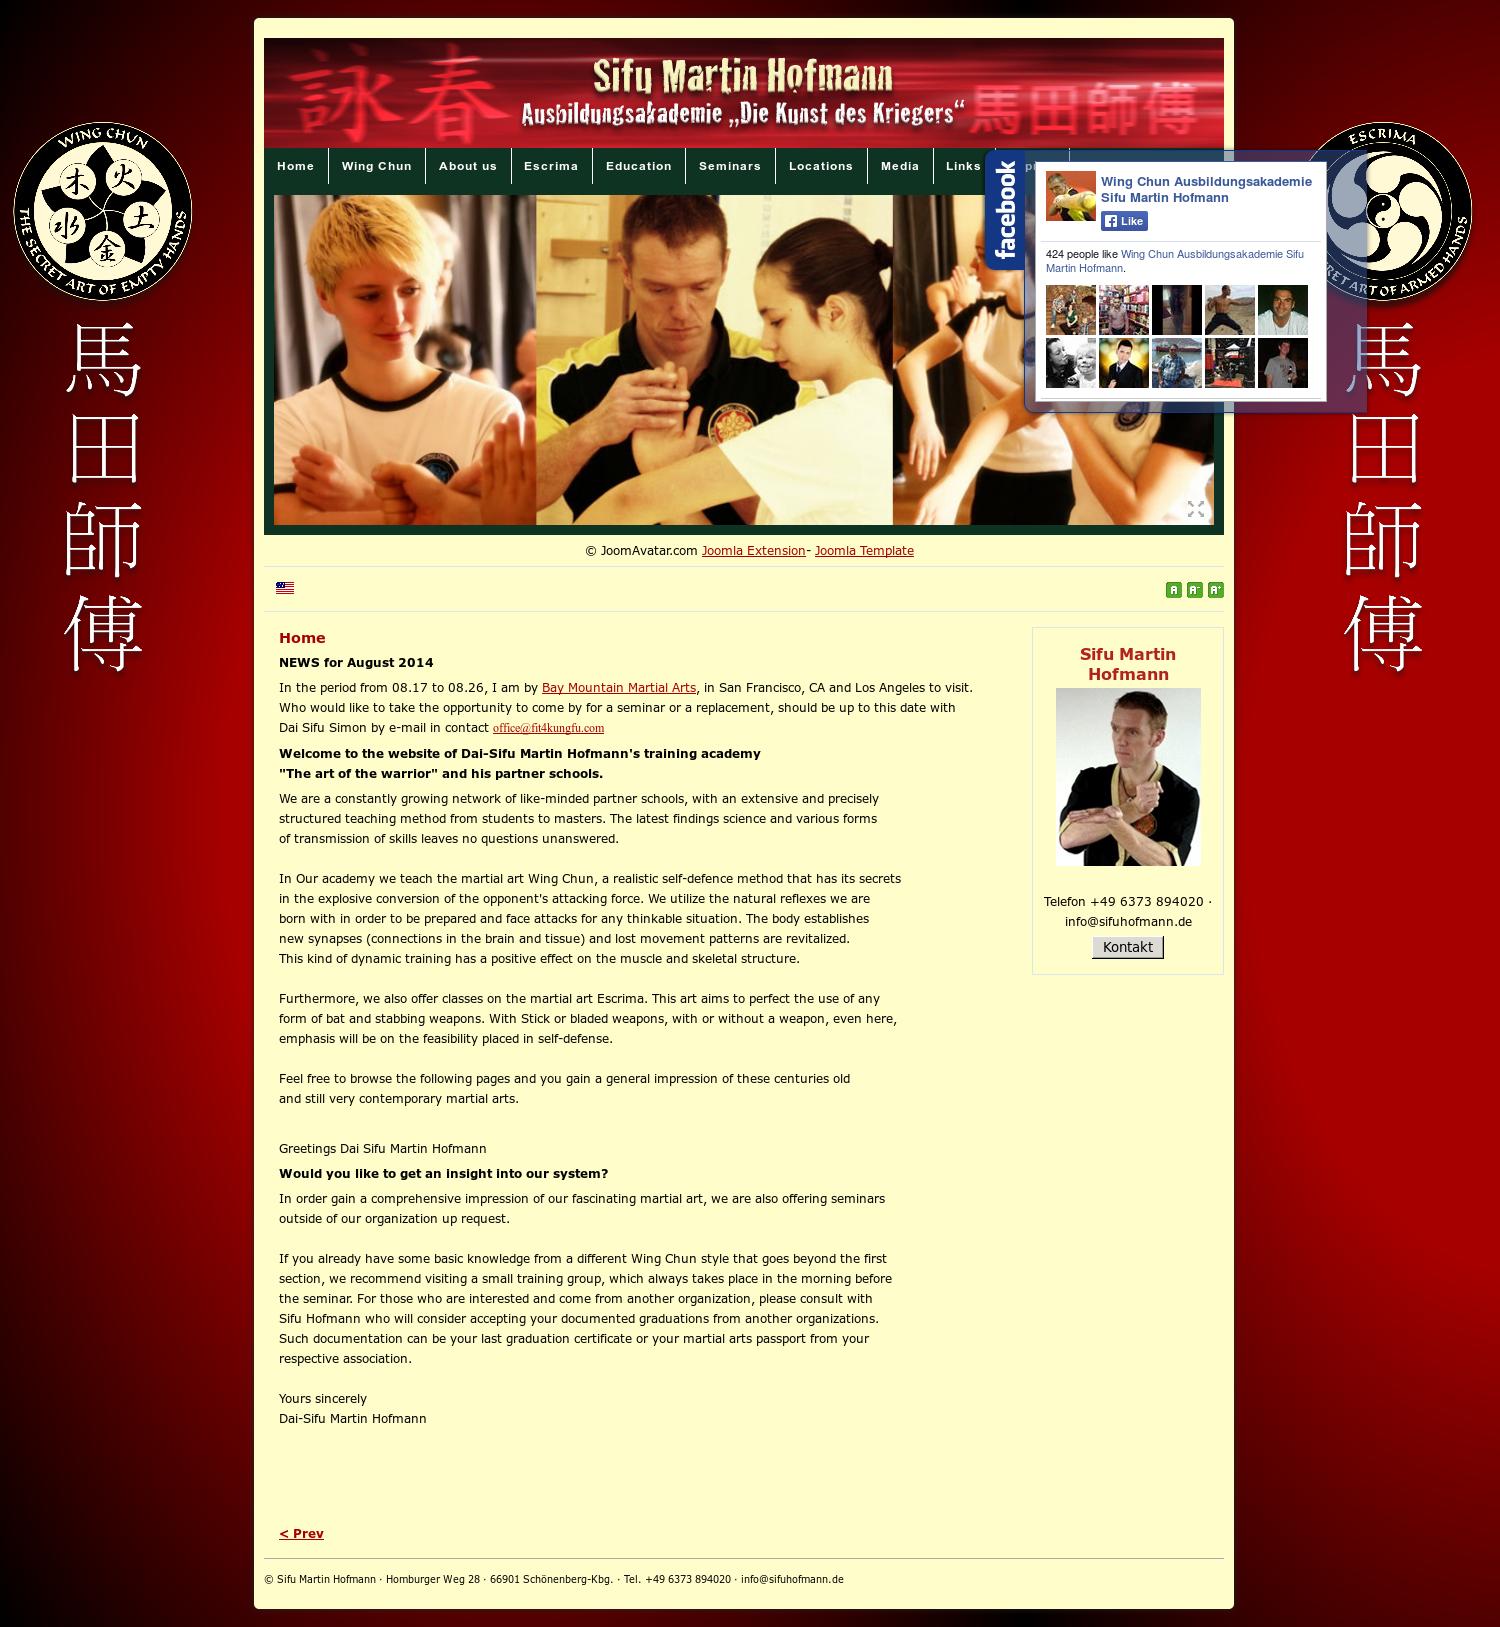 Wing Chun Ausbildungsakademie Sifu Martin Hofmann Competitors